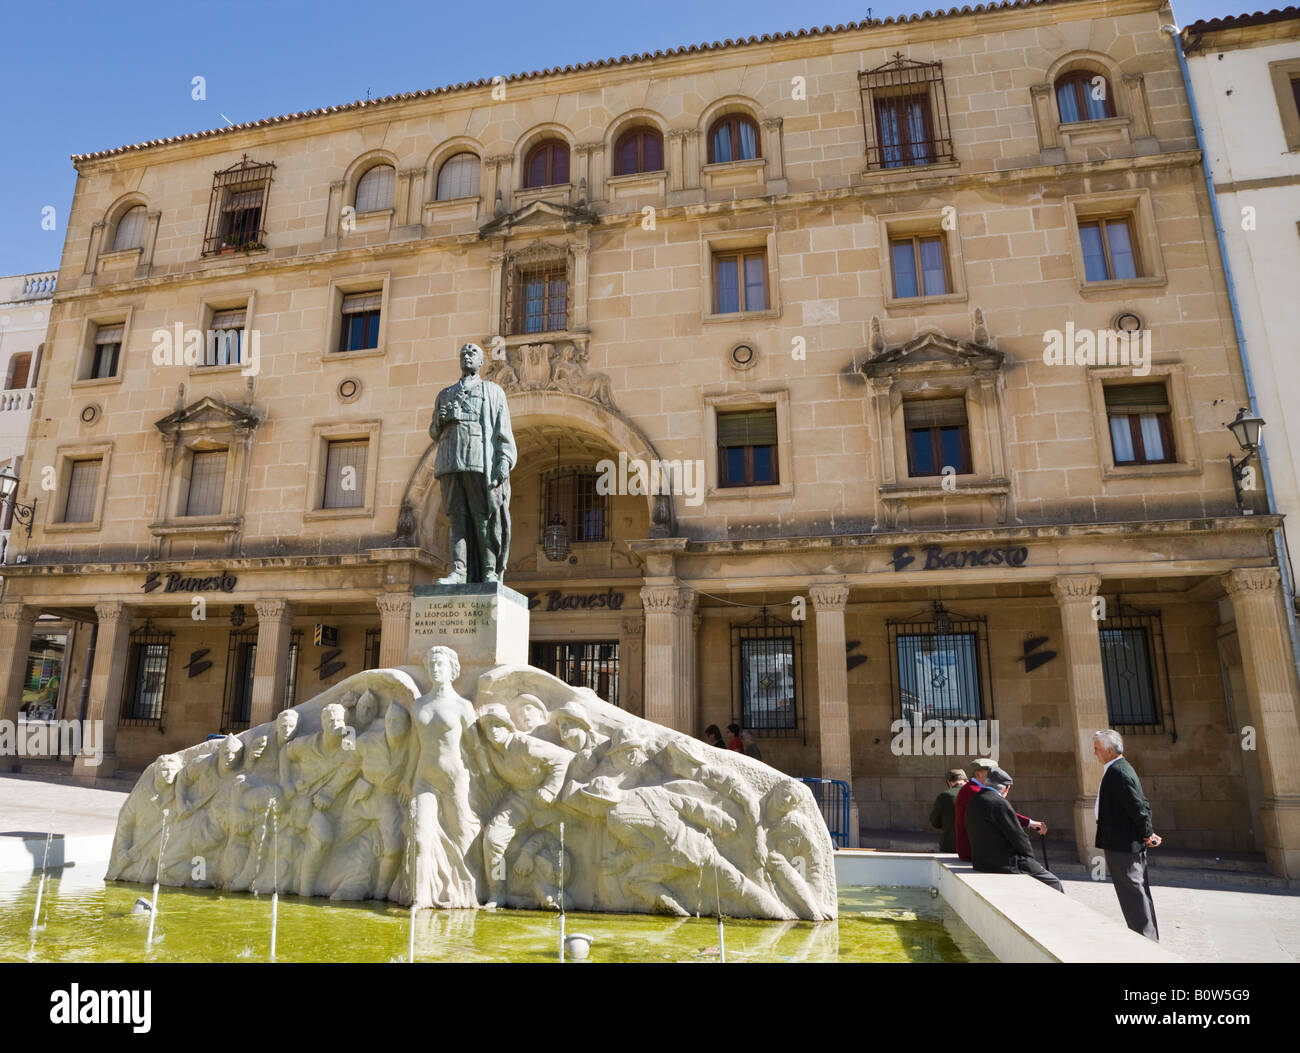 Ubeda Jaen Province Spain Monument to General Leopoldo Saro Marin 1878 to 1936 in Plaza de Andalucia Stock Photo